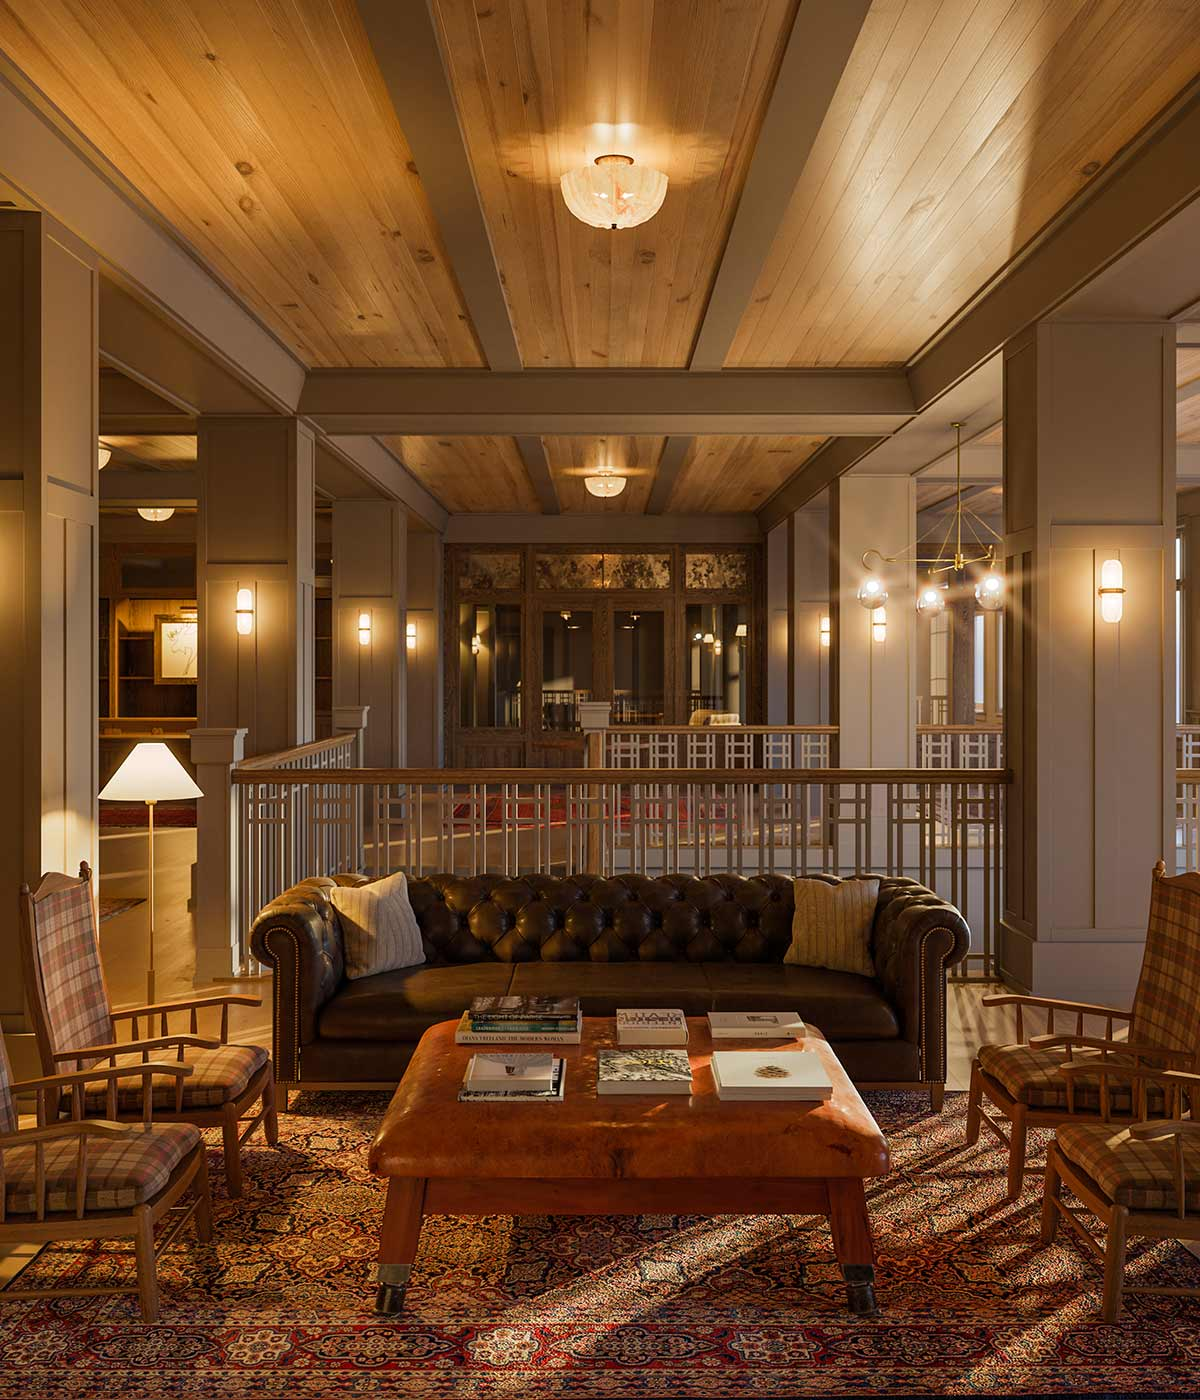 The Grand Adirondack Hotel lobby seating area under dim lighting